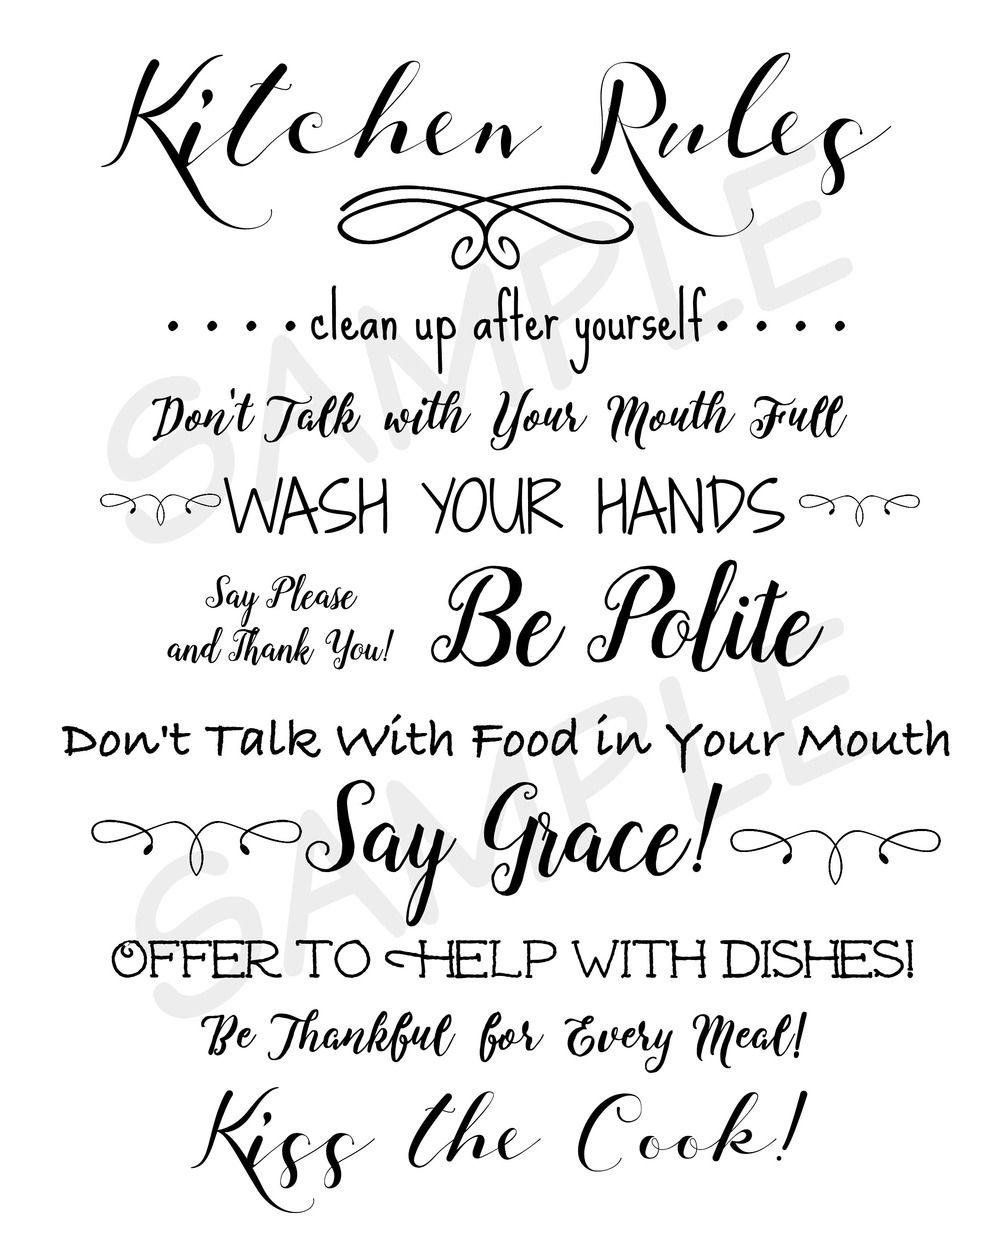 kitchen rules printable kitchen rules kitchen printables kitchen rules sign on kitchen quotes printable id=44846